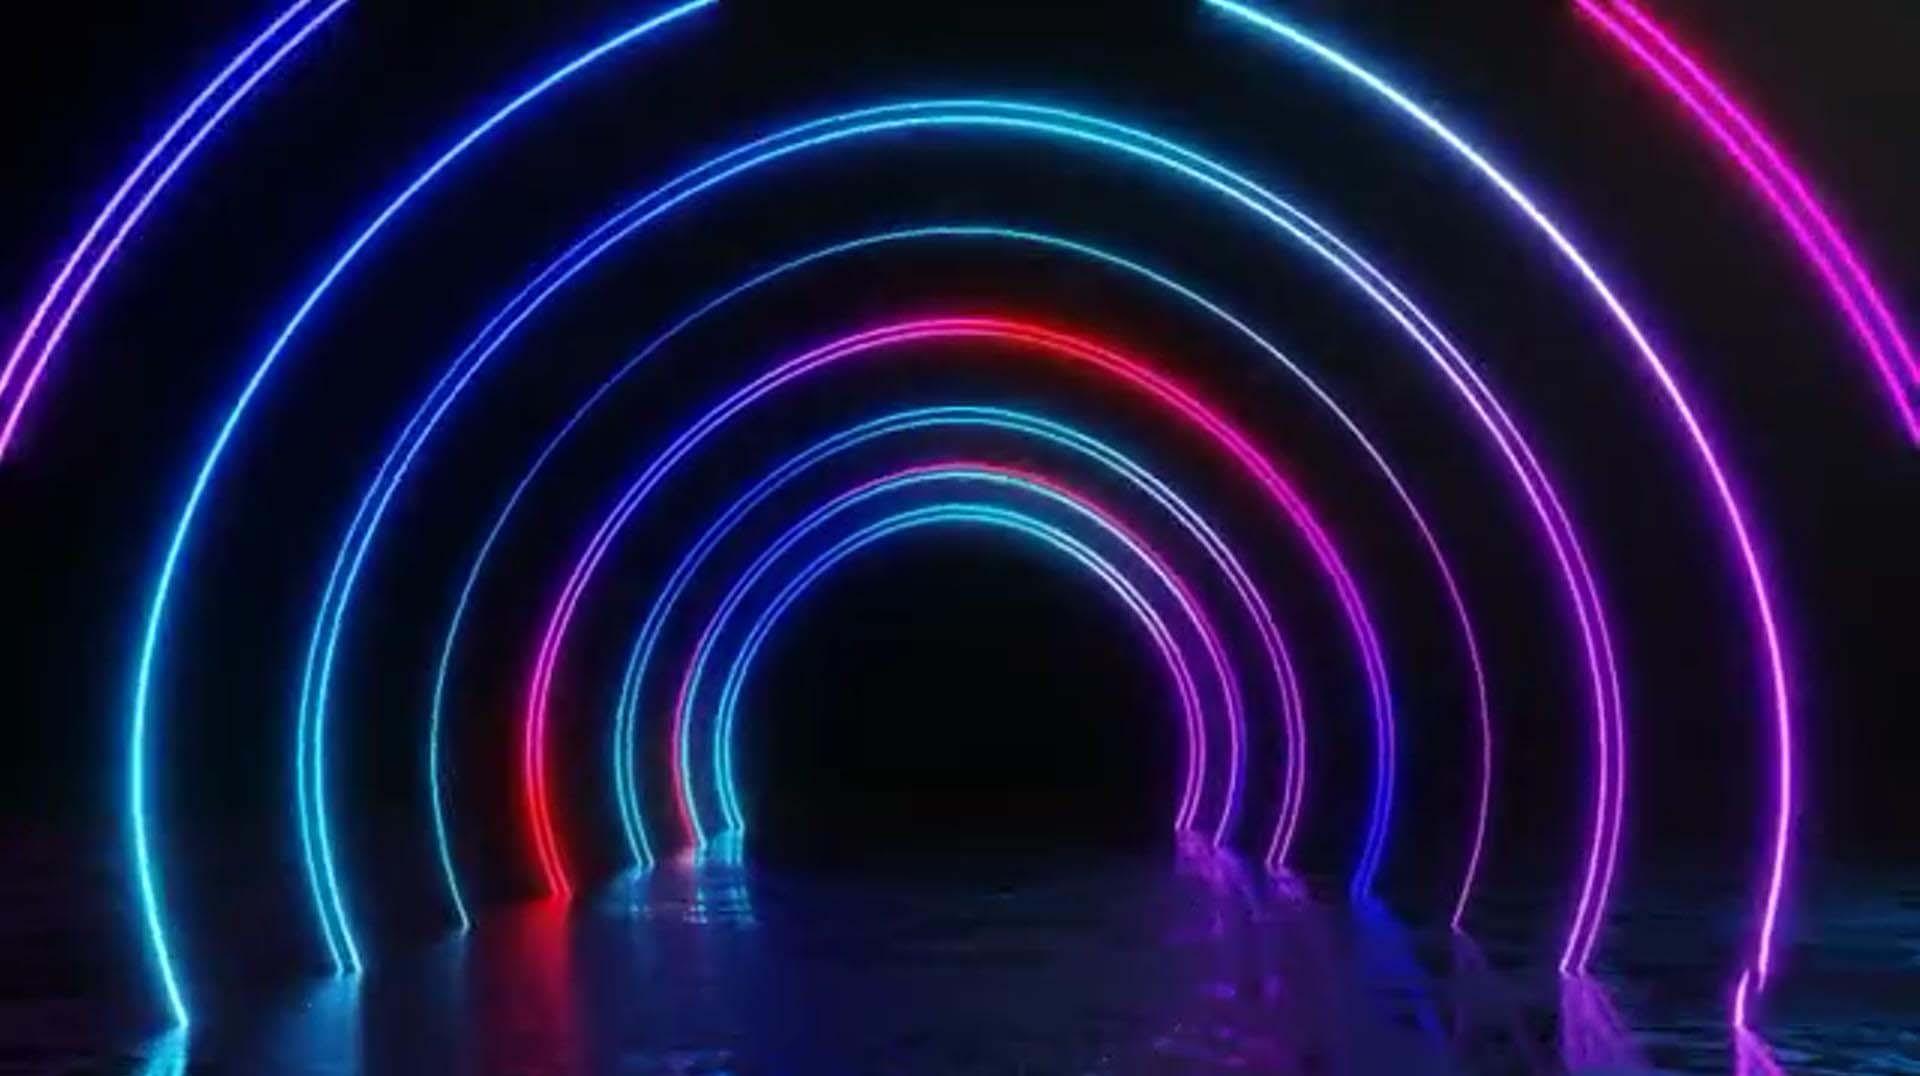 穿越霓虹隧道后出现的logo特效<a href='/zyxz/hqsc/191' target='_blank' style='color: #0070C0;text-decoration: underline;'>AE模板</a>